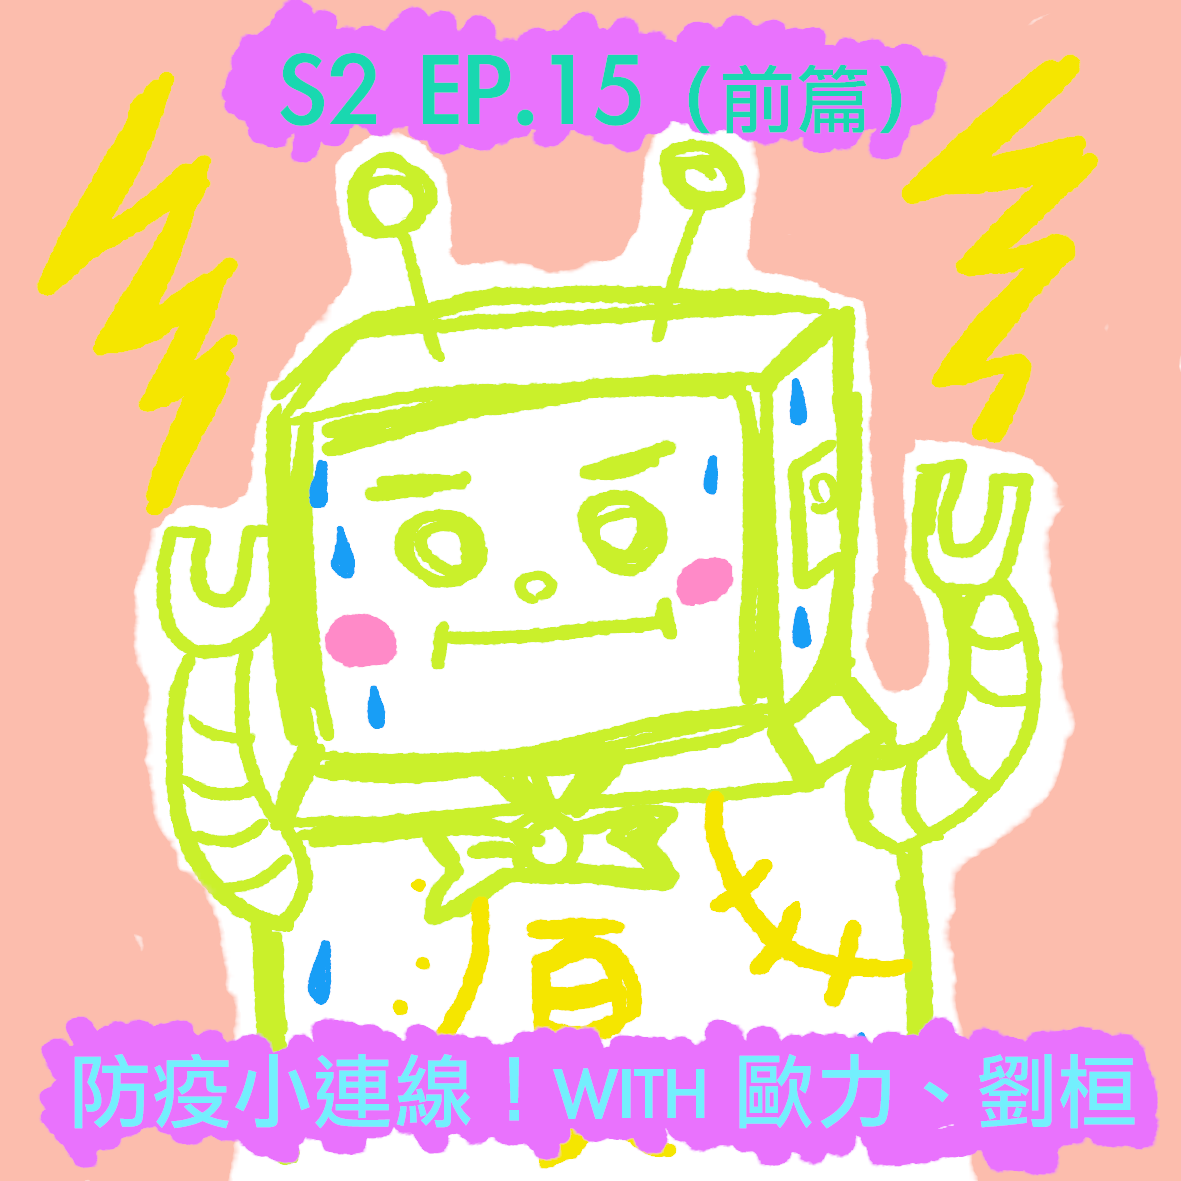 S2|EP.15|防疫小連線!前篇!with 歐力、劉桓